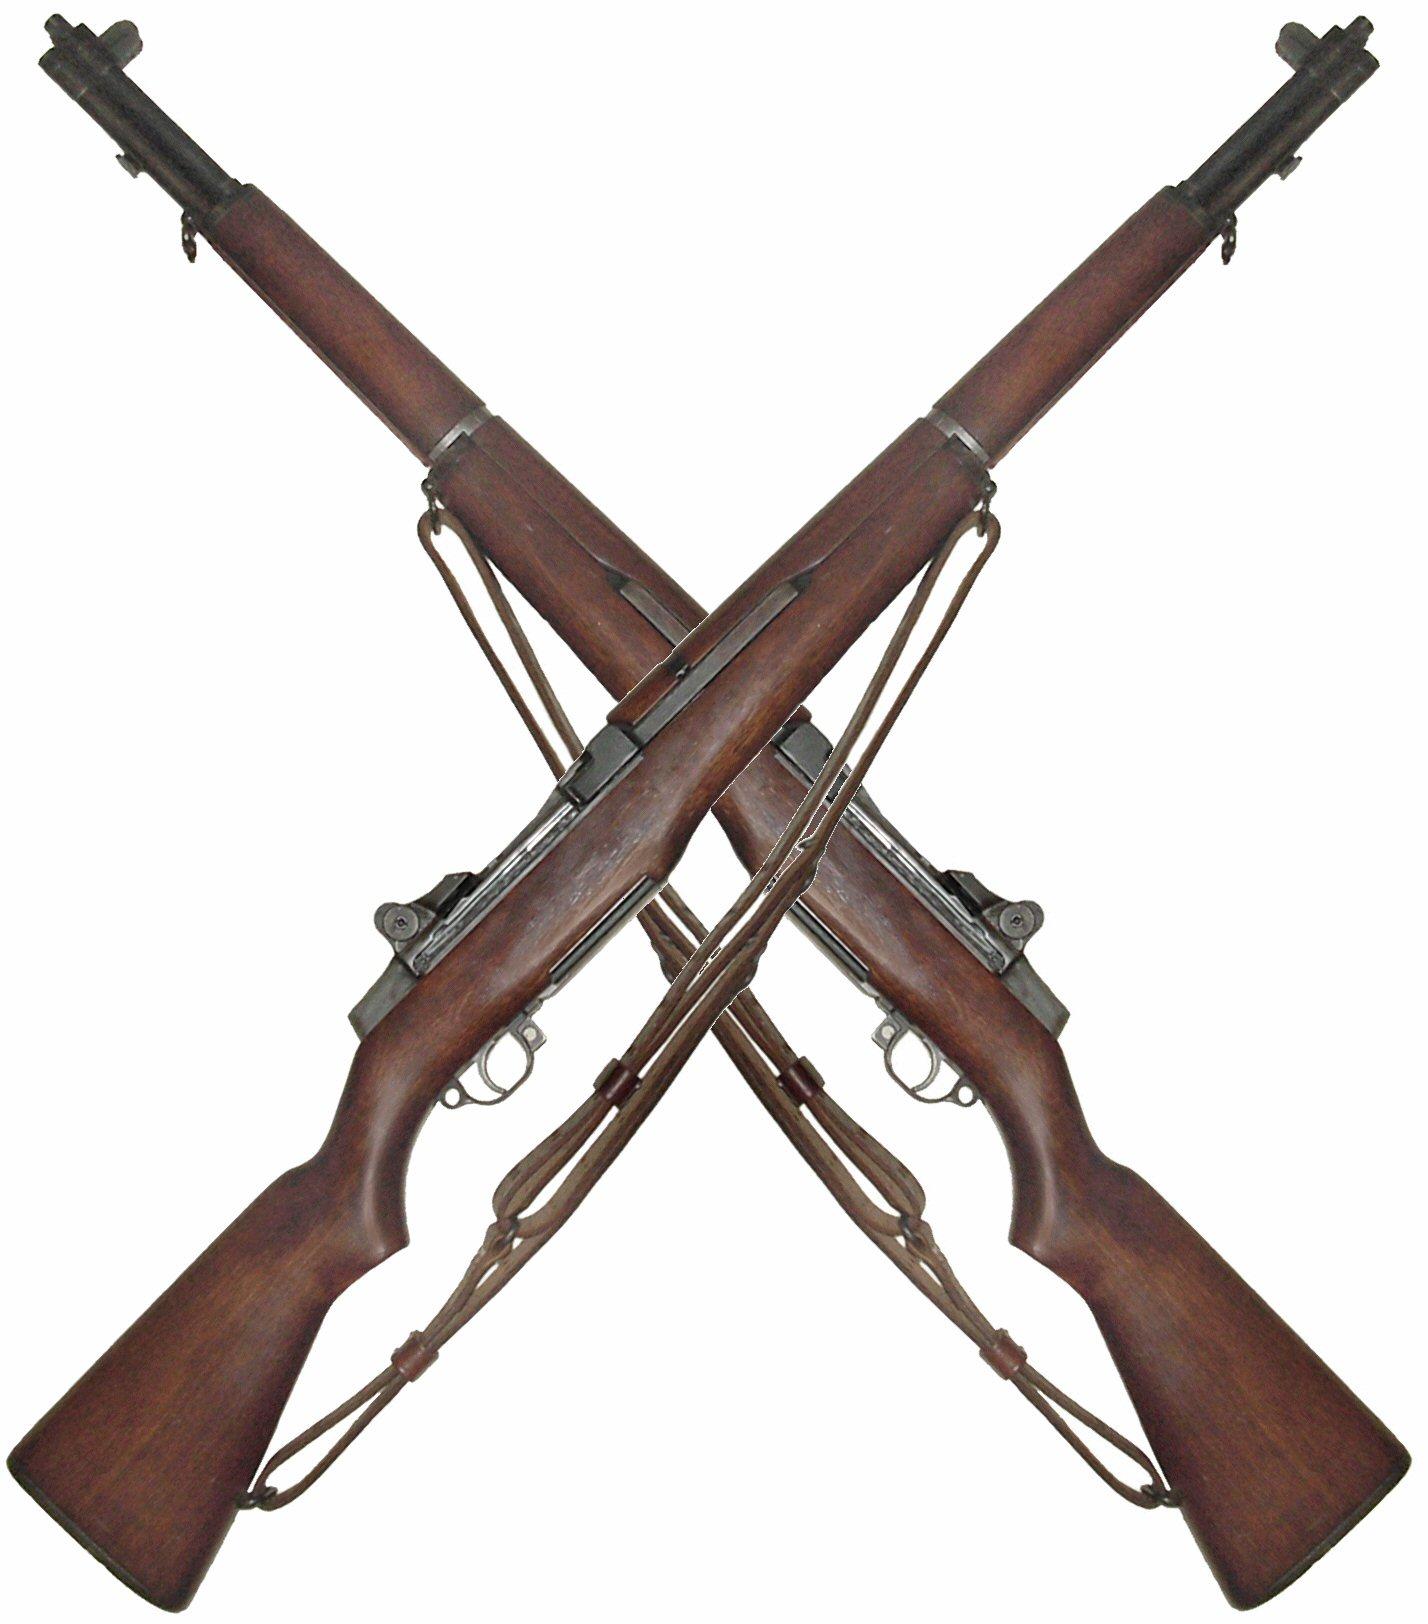 M1 garand rifle match